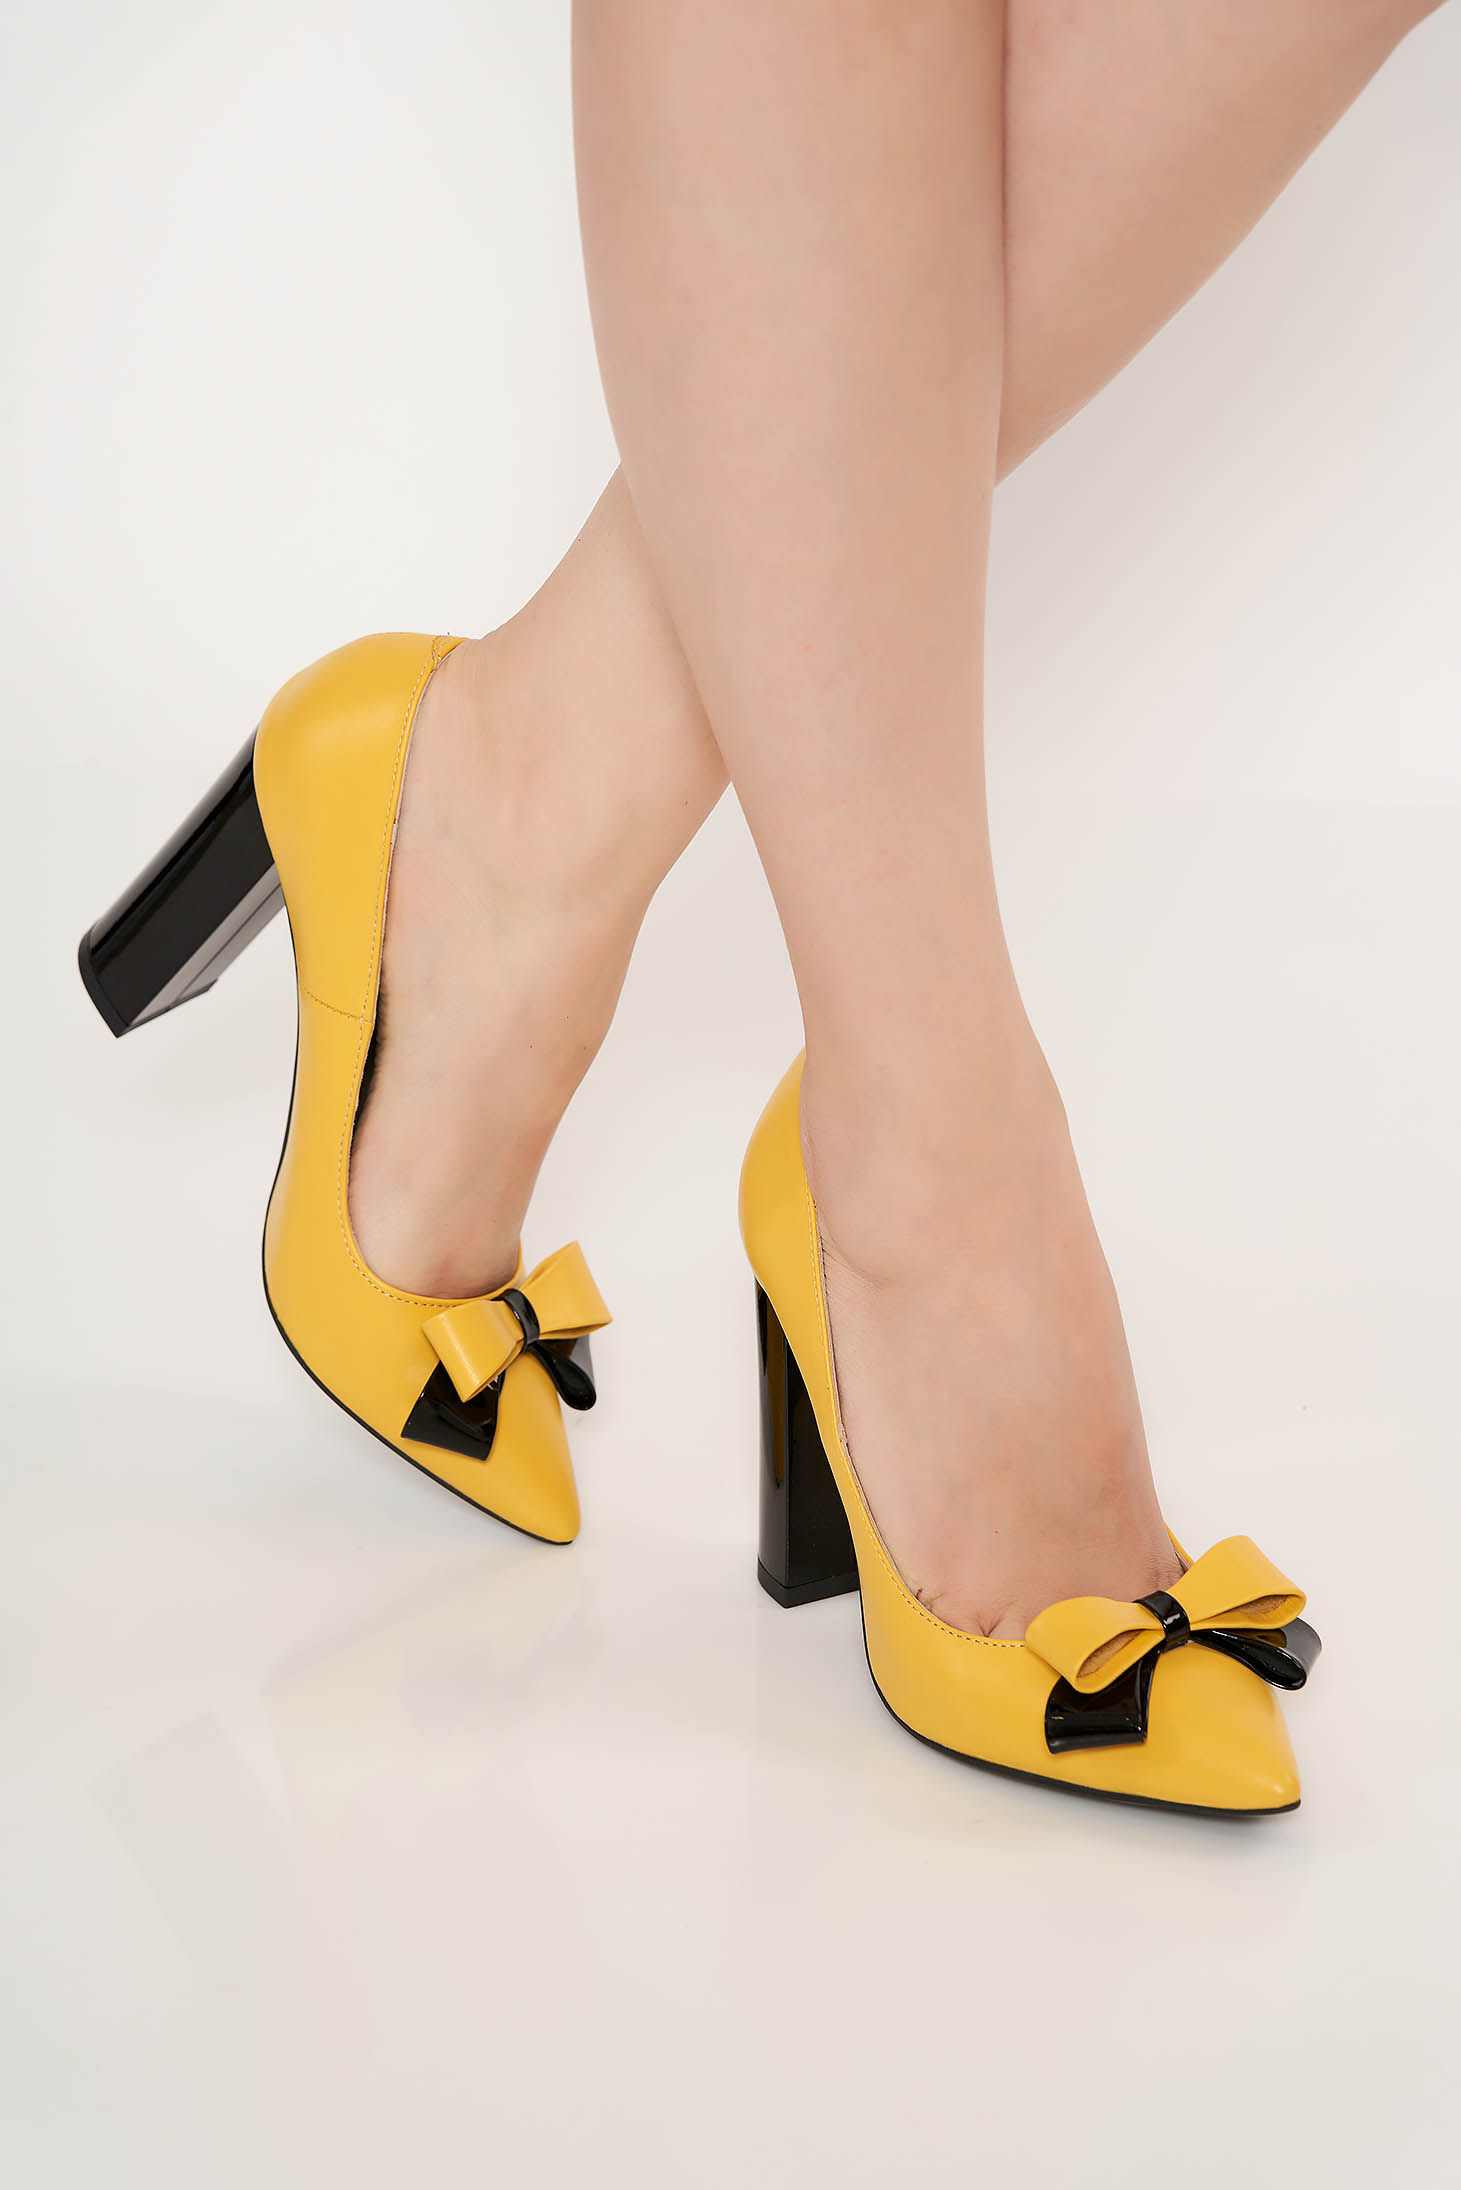 Pantofi galben office din piele naturala cu toc gros cu varful usor ascutit accesorizat cu o fundita